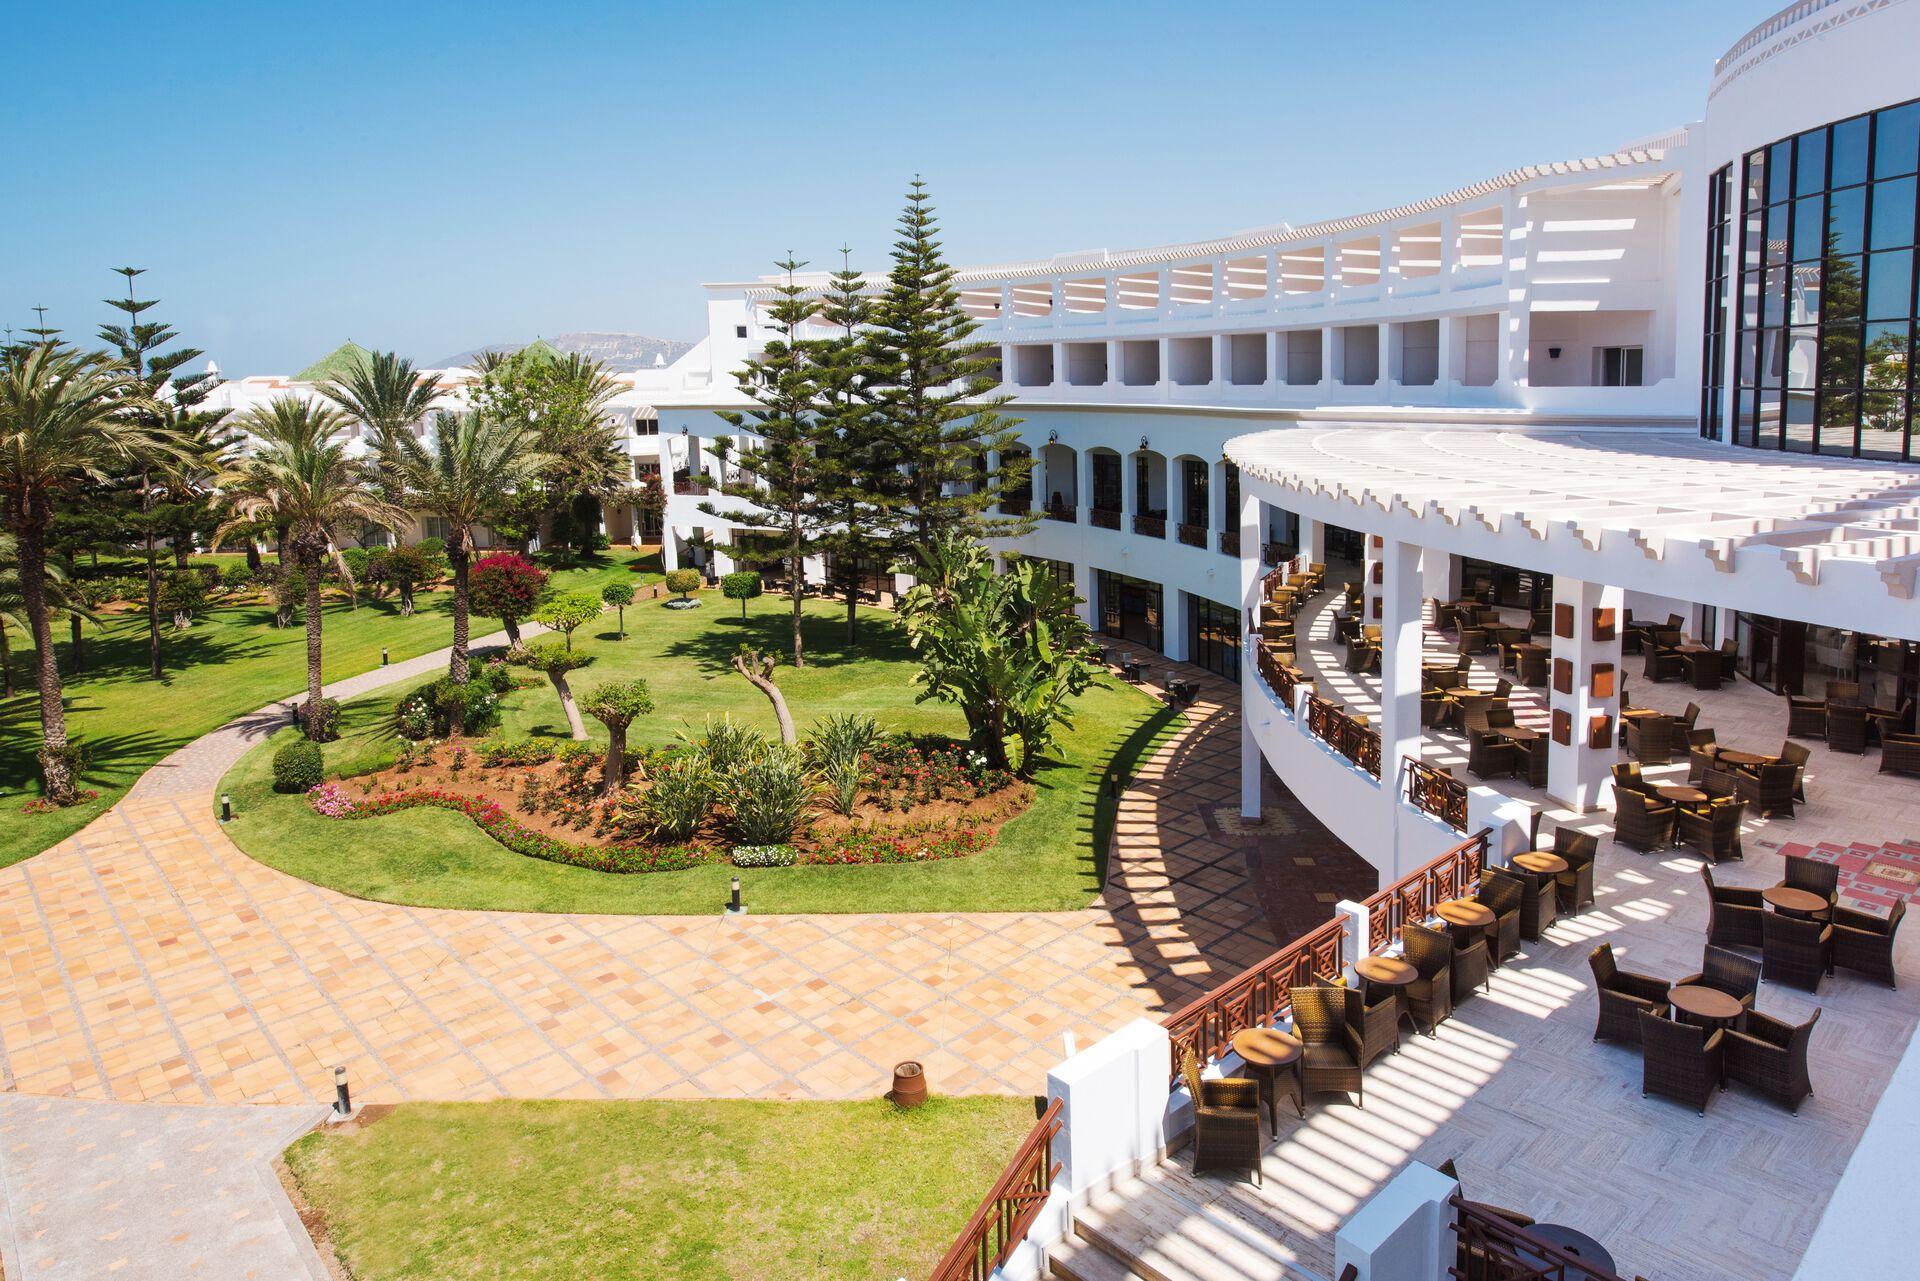 Maroc - Agadir - Hôtel Iberostar Founty Beach 4*